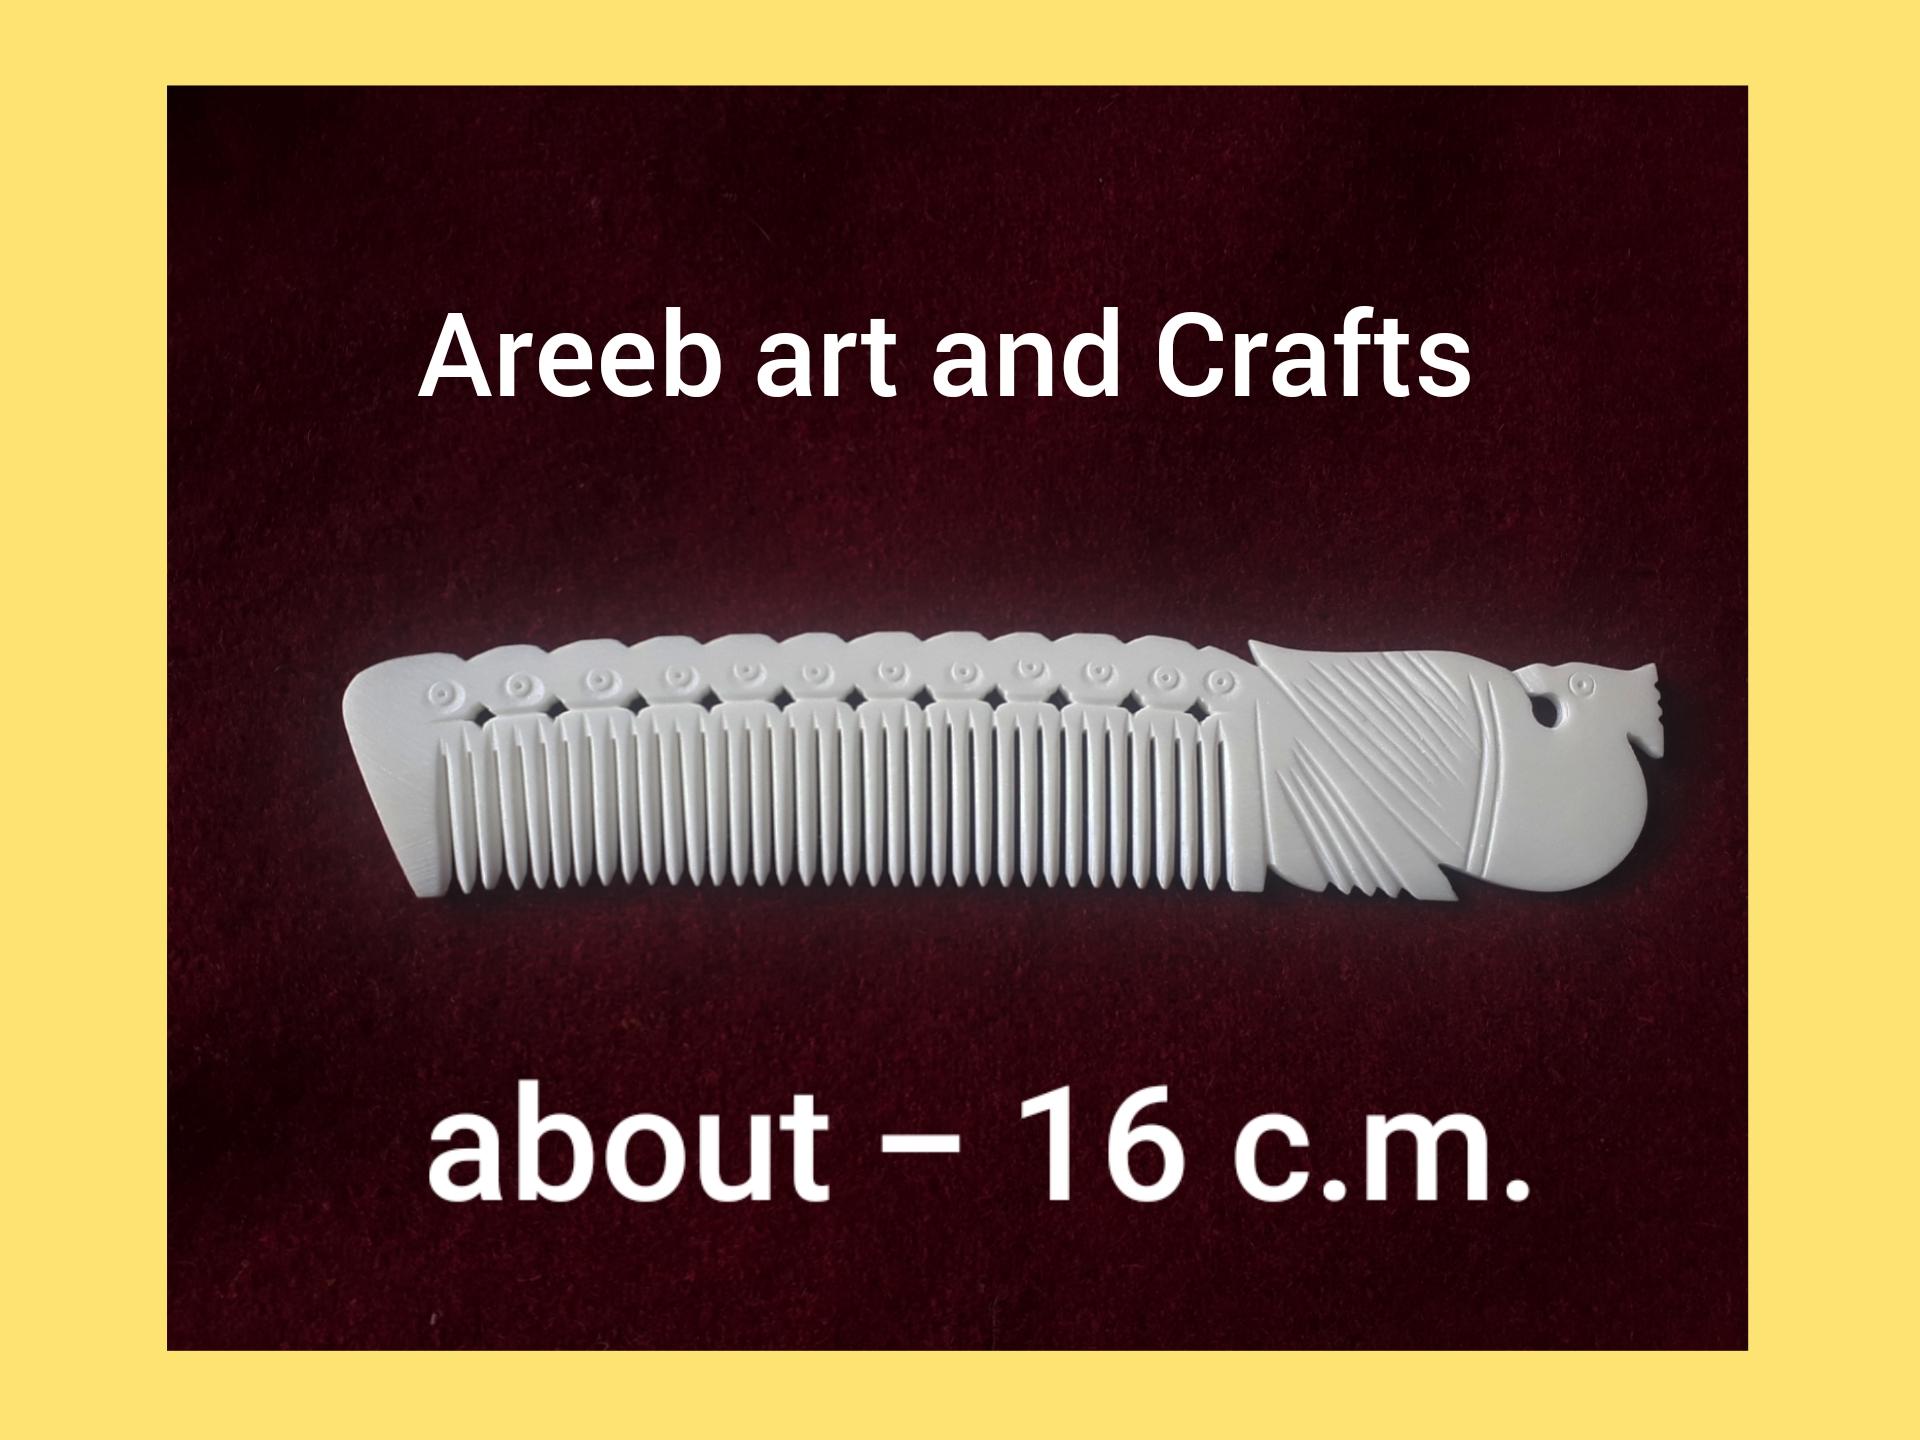 Bone viking carving comb